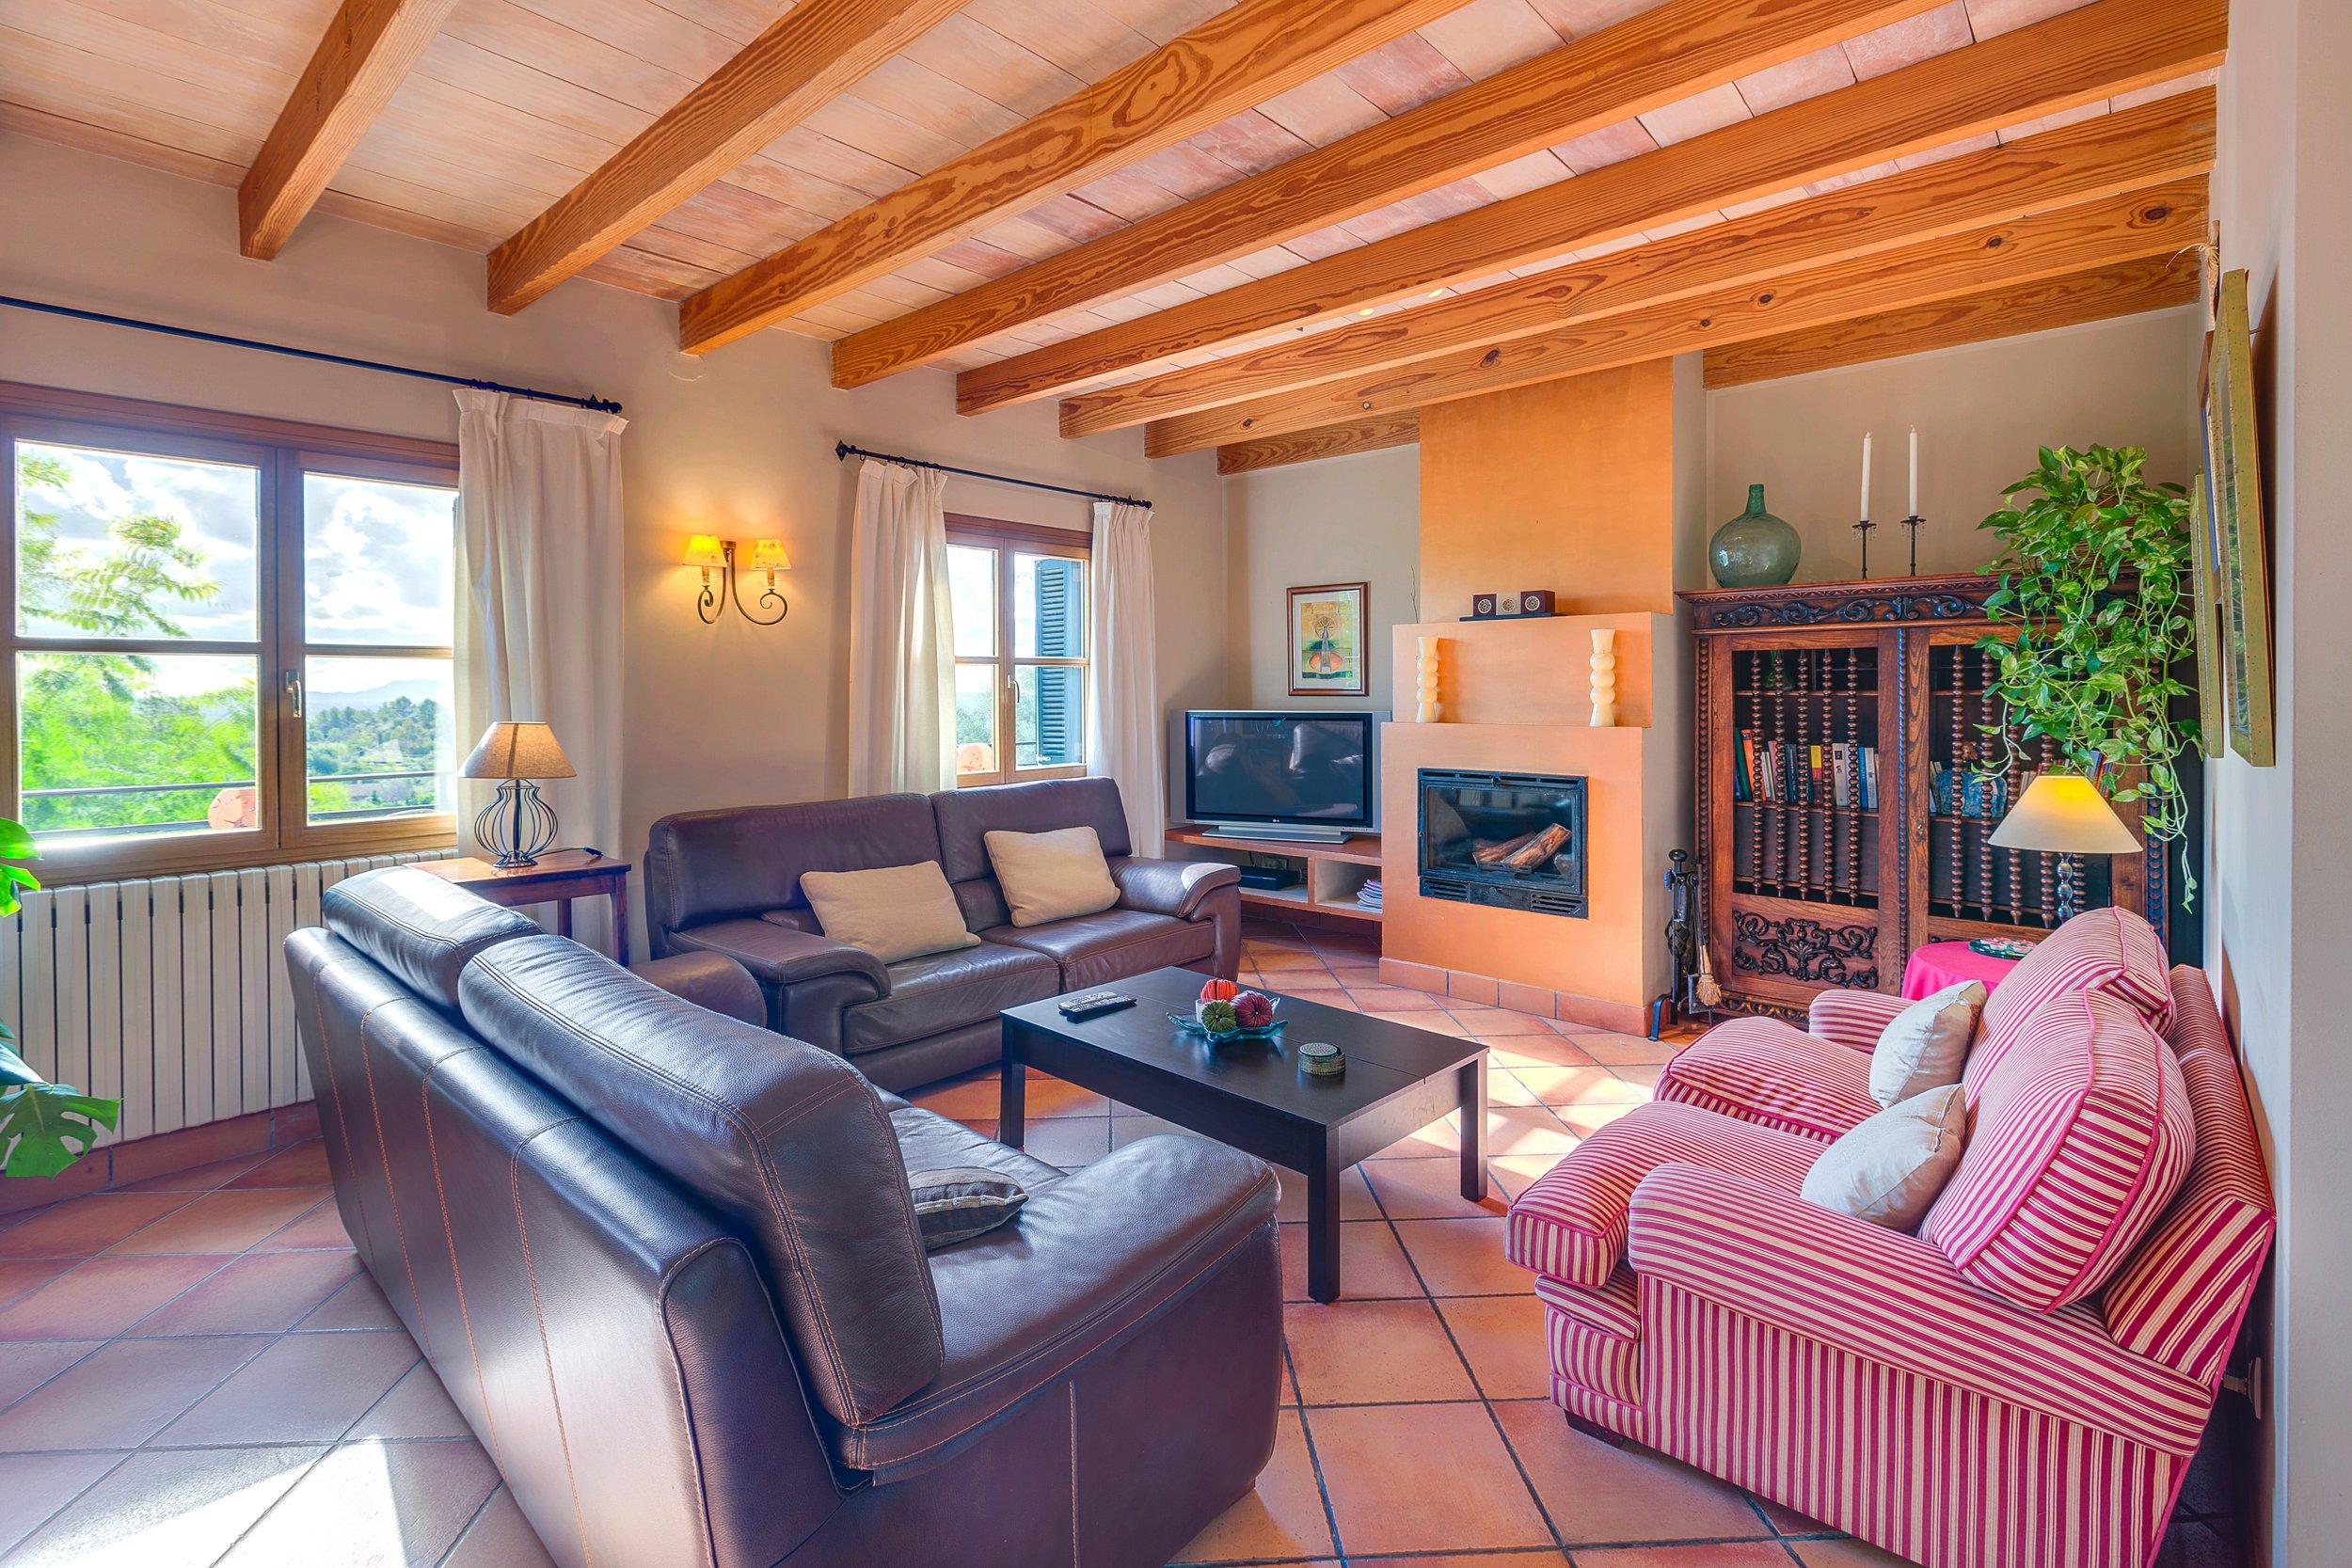 Maison de vacances Villa Cirera in Alaro (2611793), Alaro, Majorque, Iles Baléares, Espagne, image 16